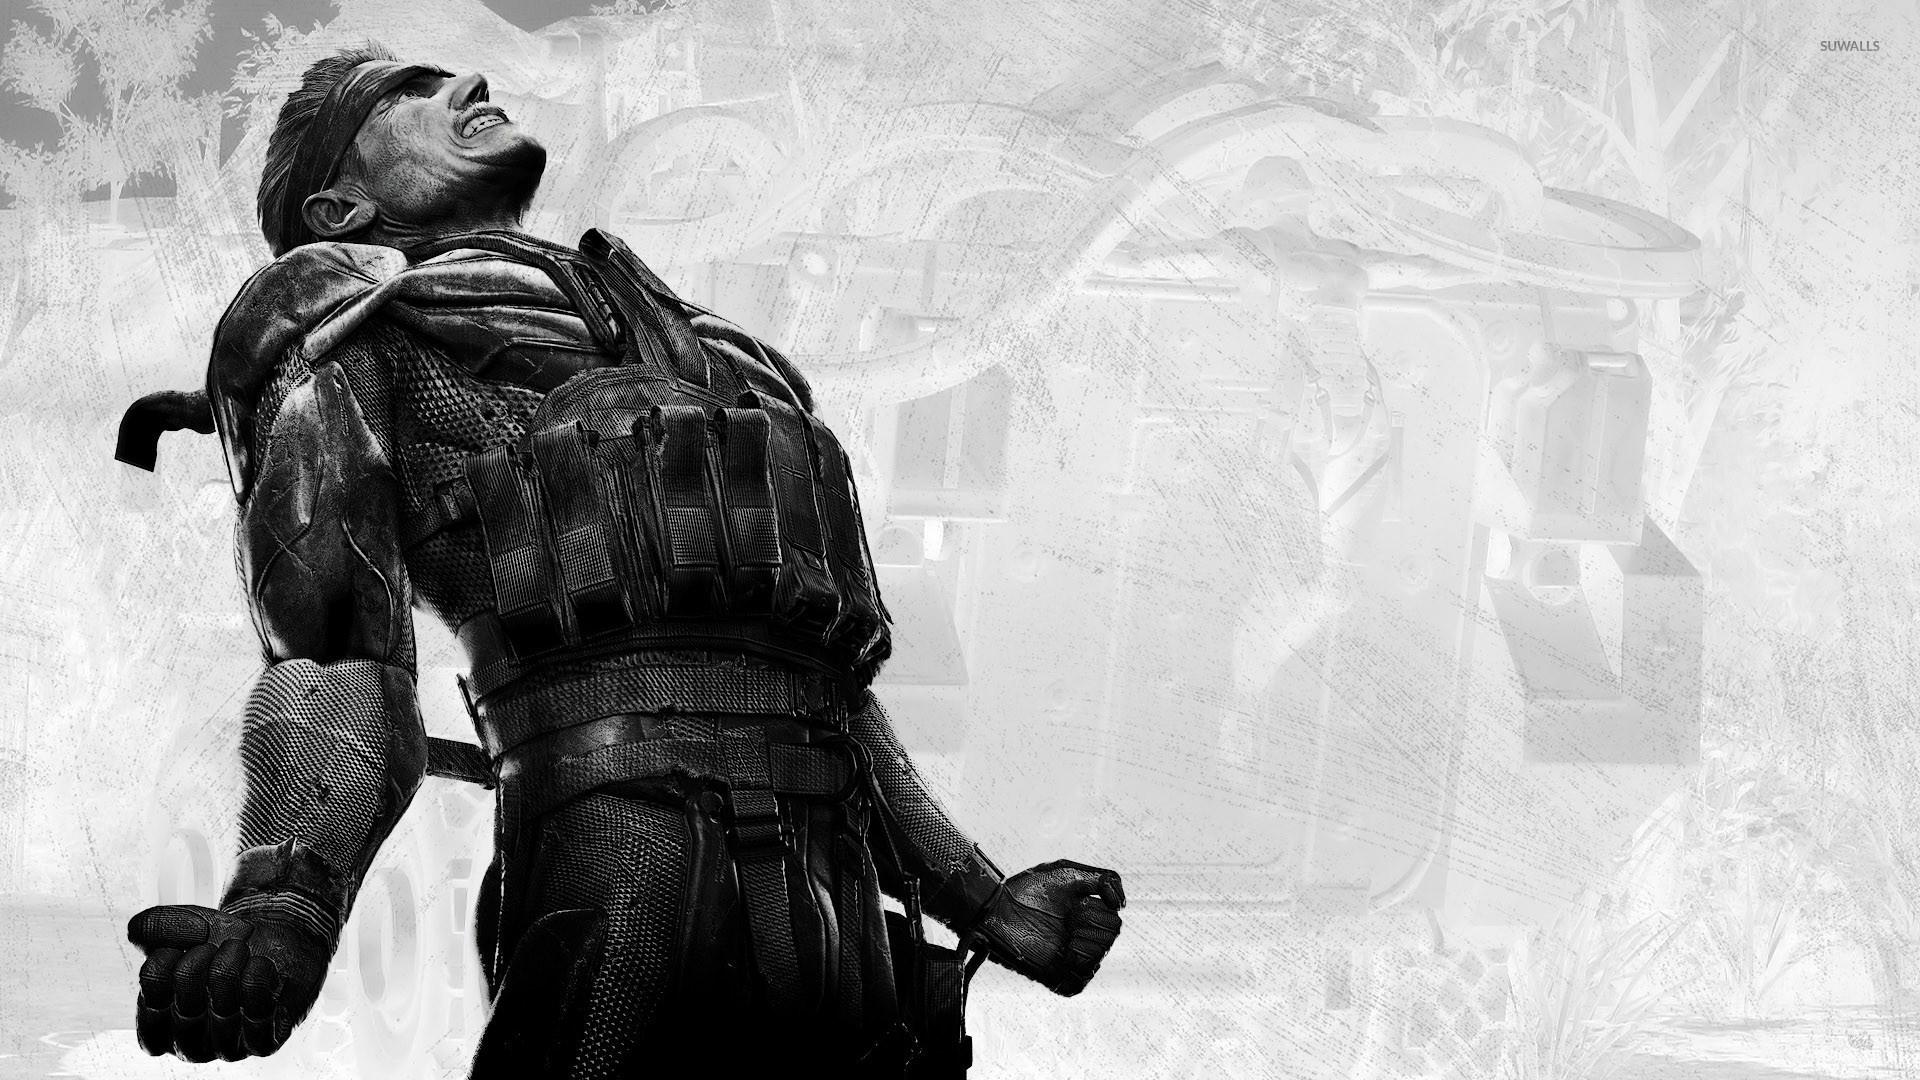 Metal Gear Solid 4 Wallpaper Wallpapertag